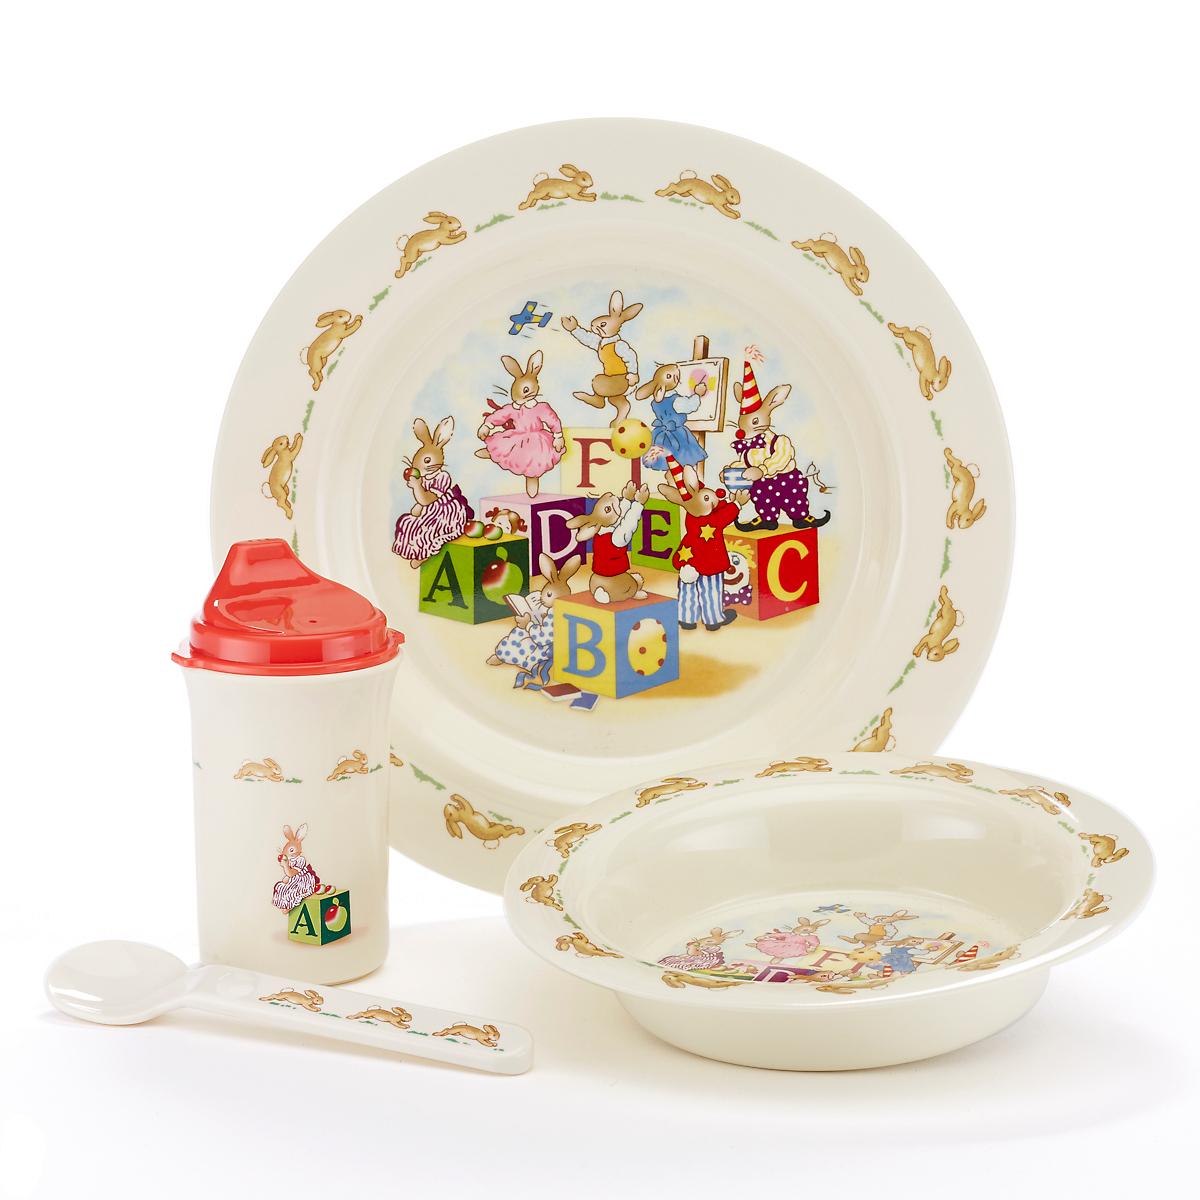 Royal Doulton Bunnykins Dinnerware 5pc Setting  sc 1 st  Gumpu0027s & Royal Doulton Bunnykins Dinnerware 5pc Setting | Gumpu0027s